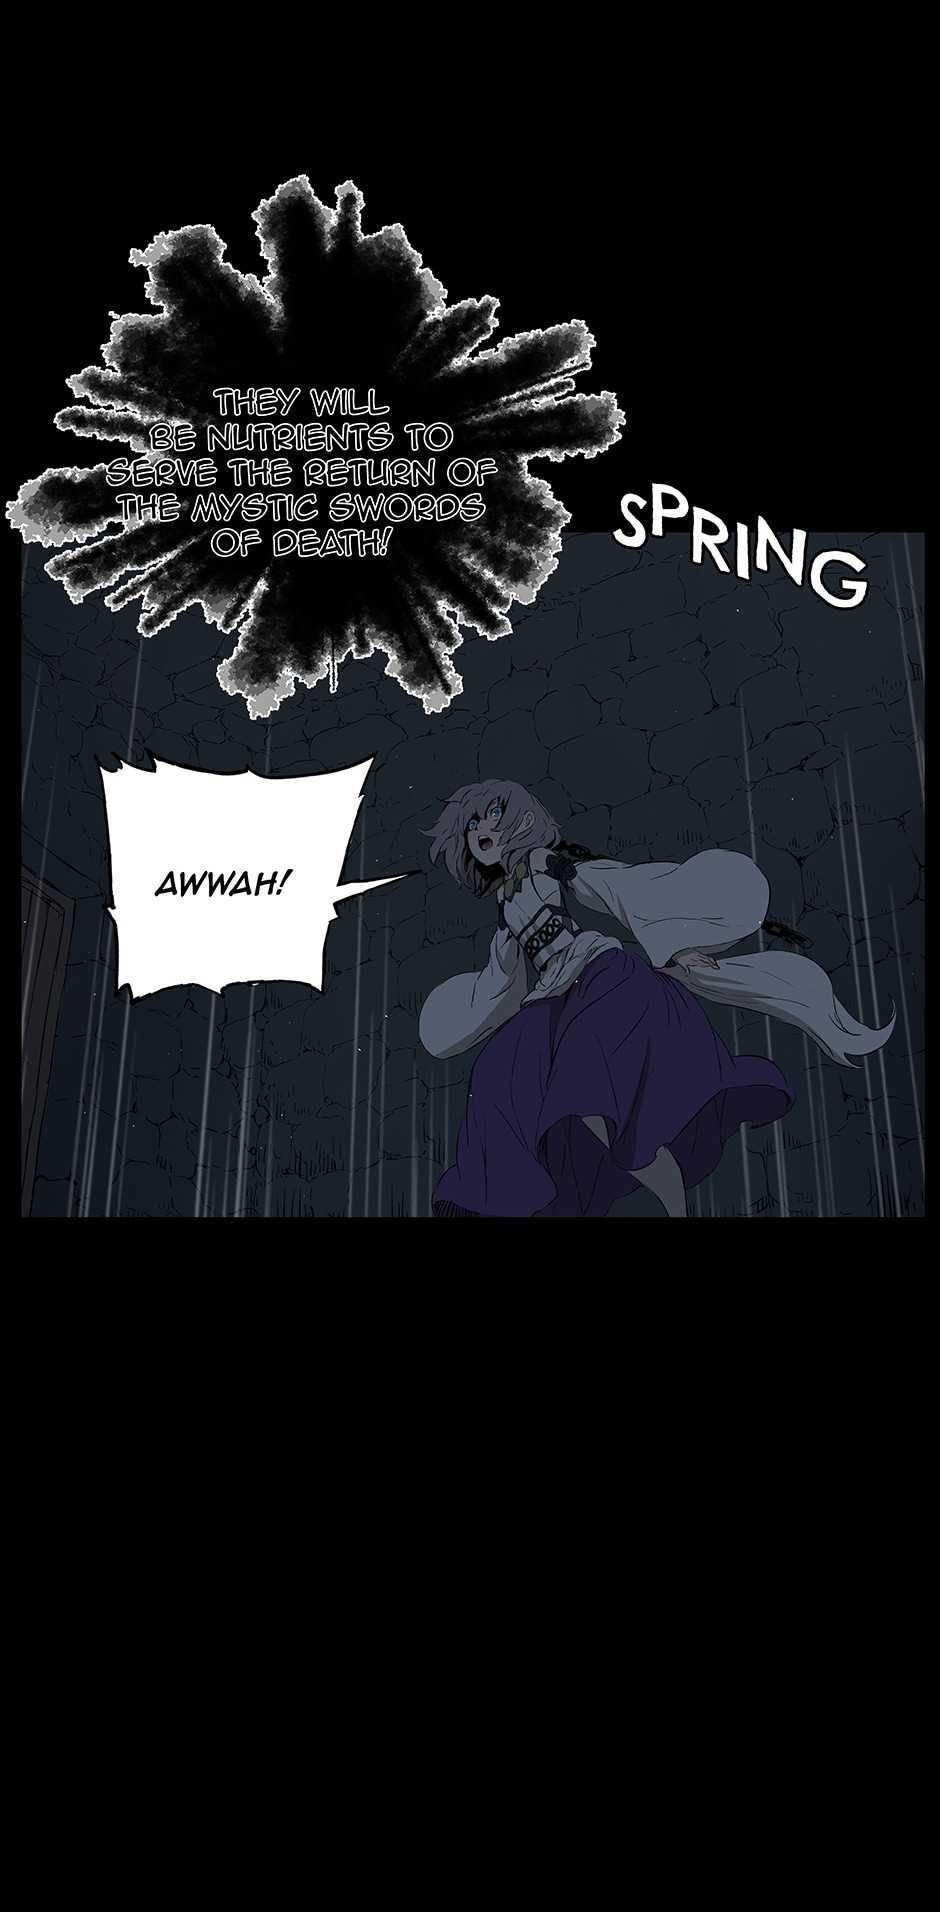 Sword Sheath's Child Chapter 71 page 71 - Mangakakalots.com